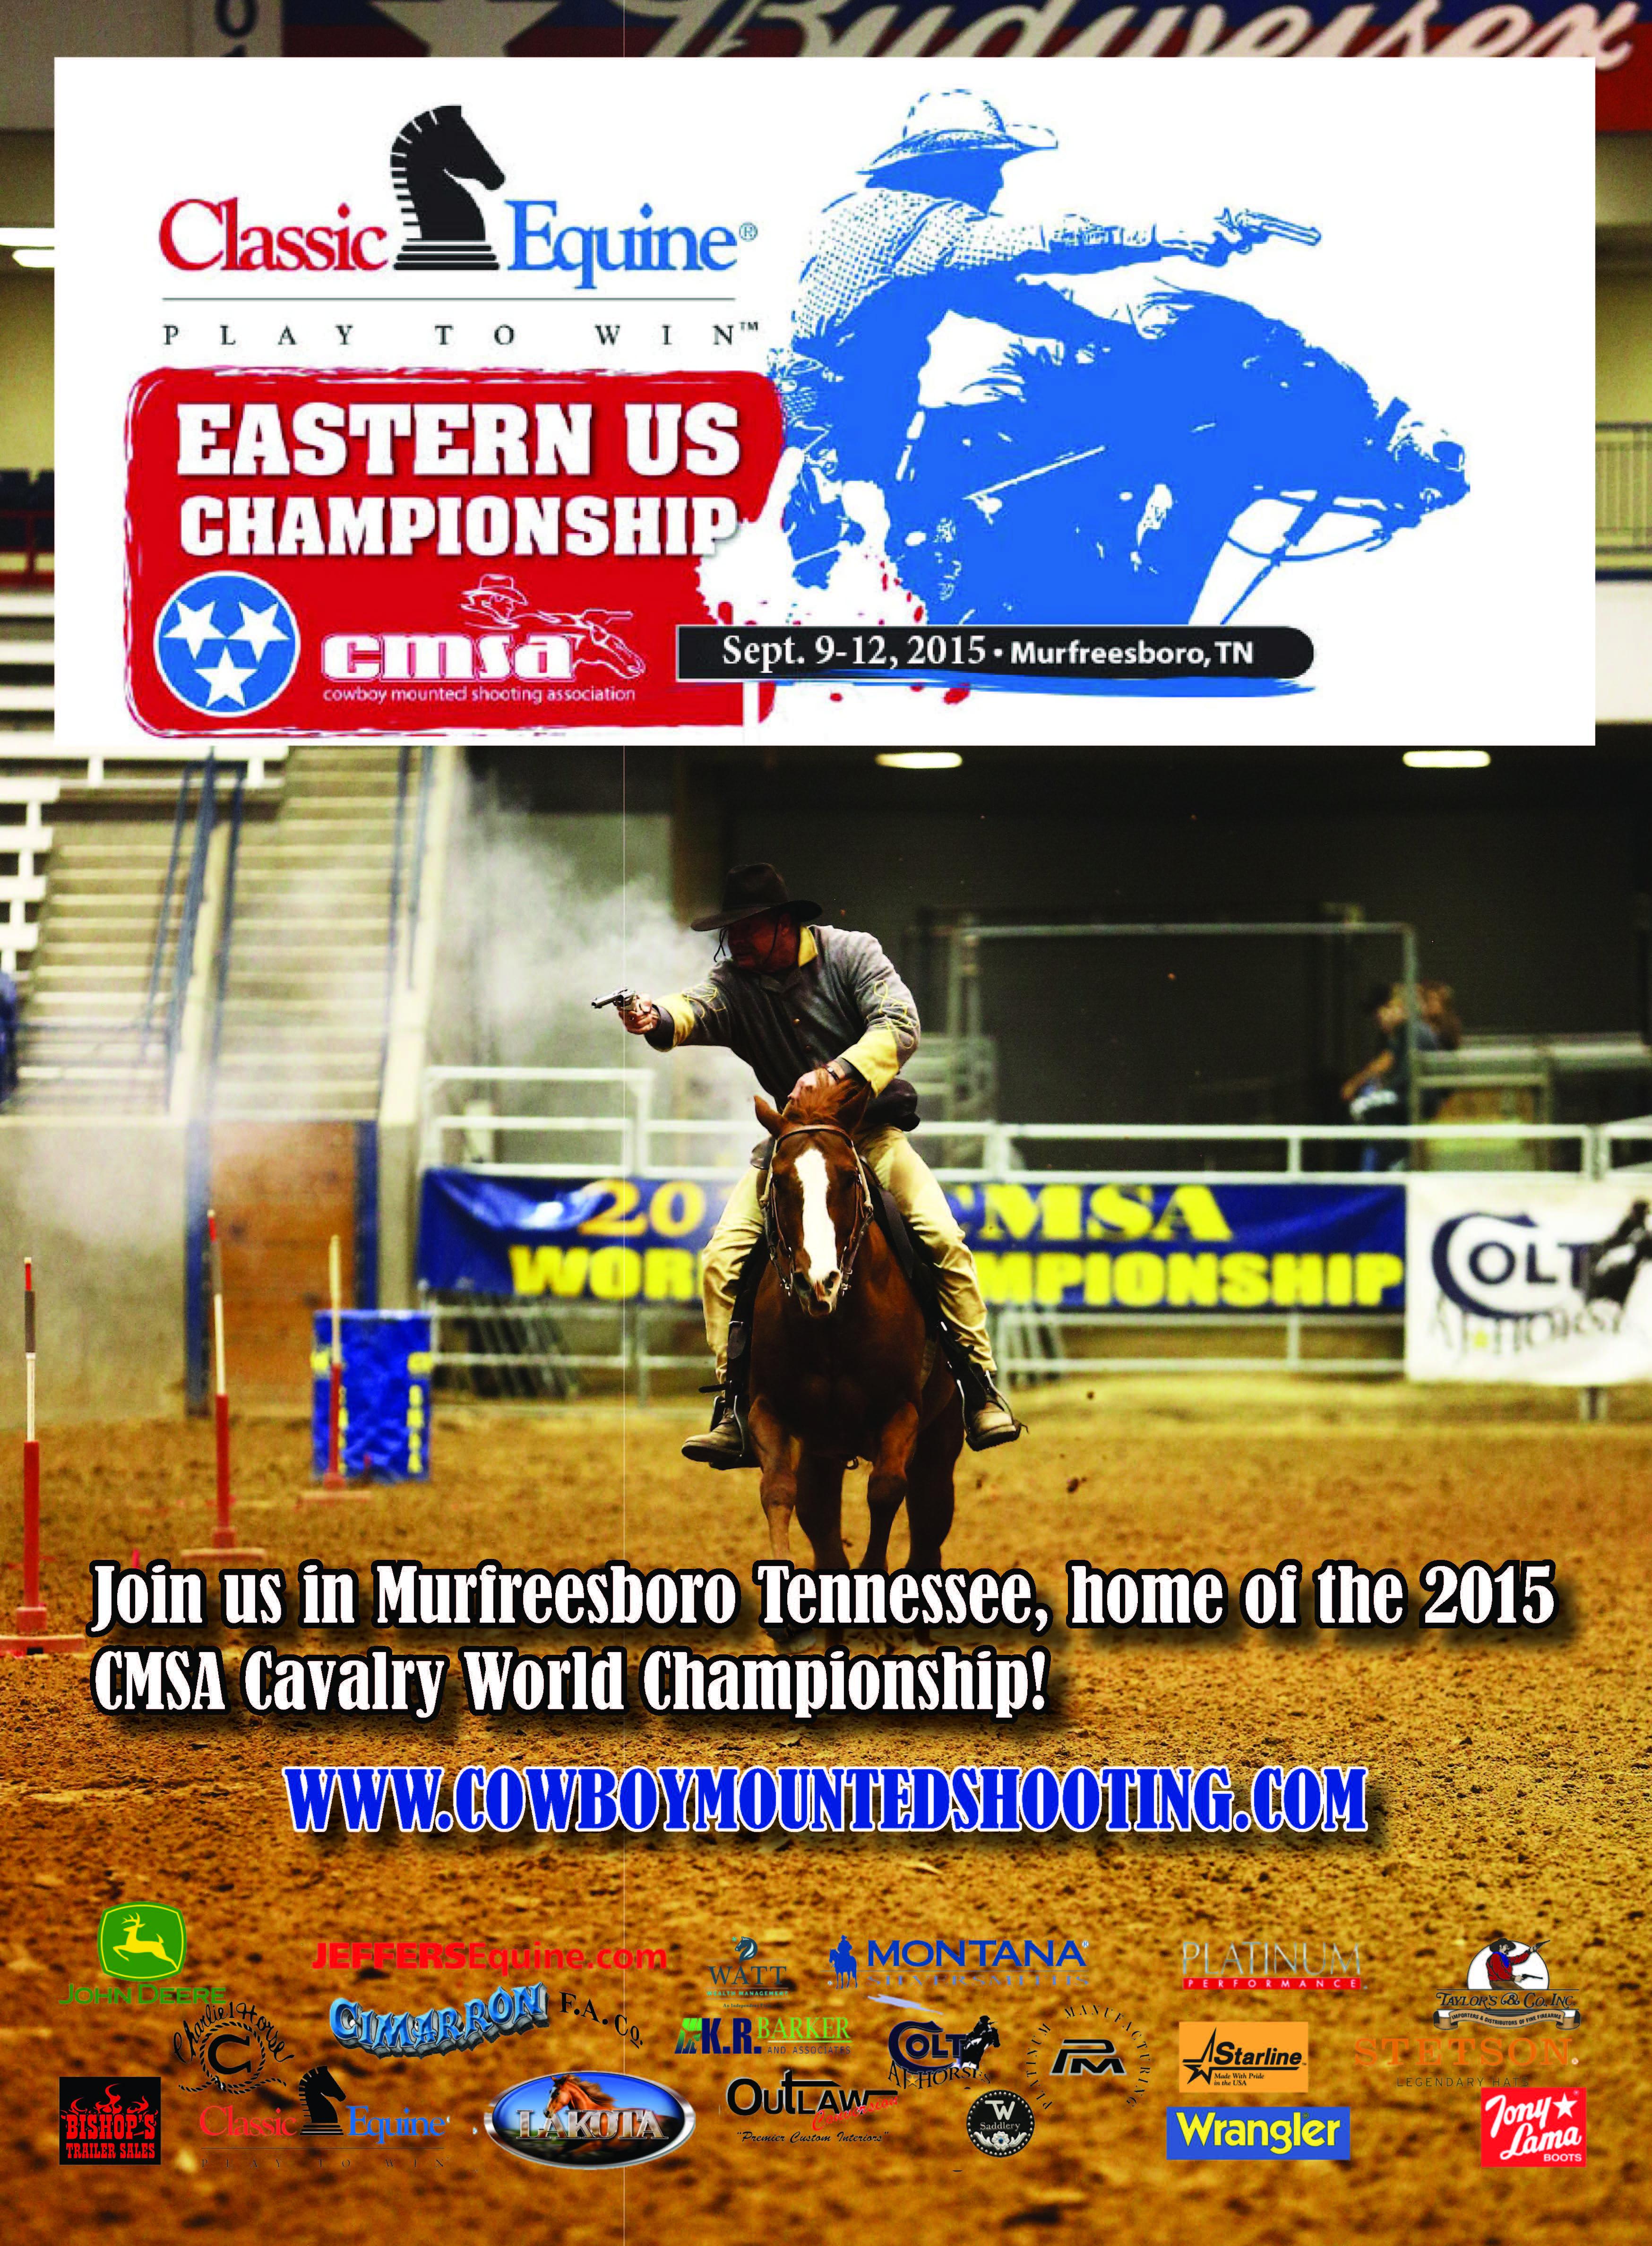 CMSA Classic Equine Eastern US Championship